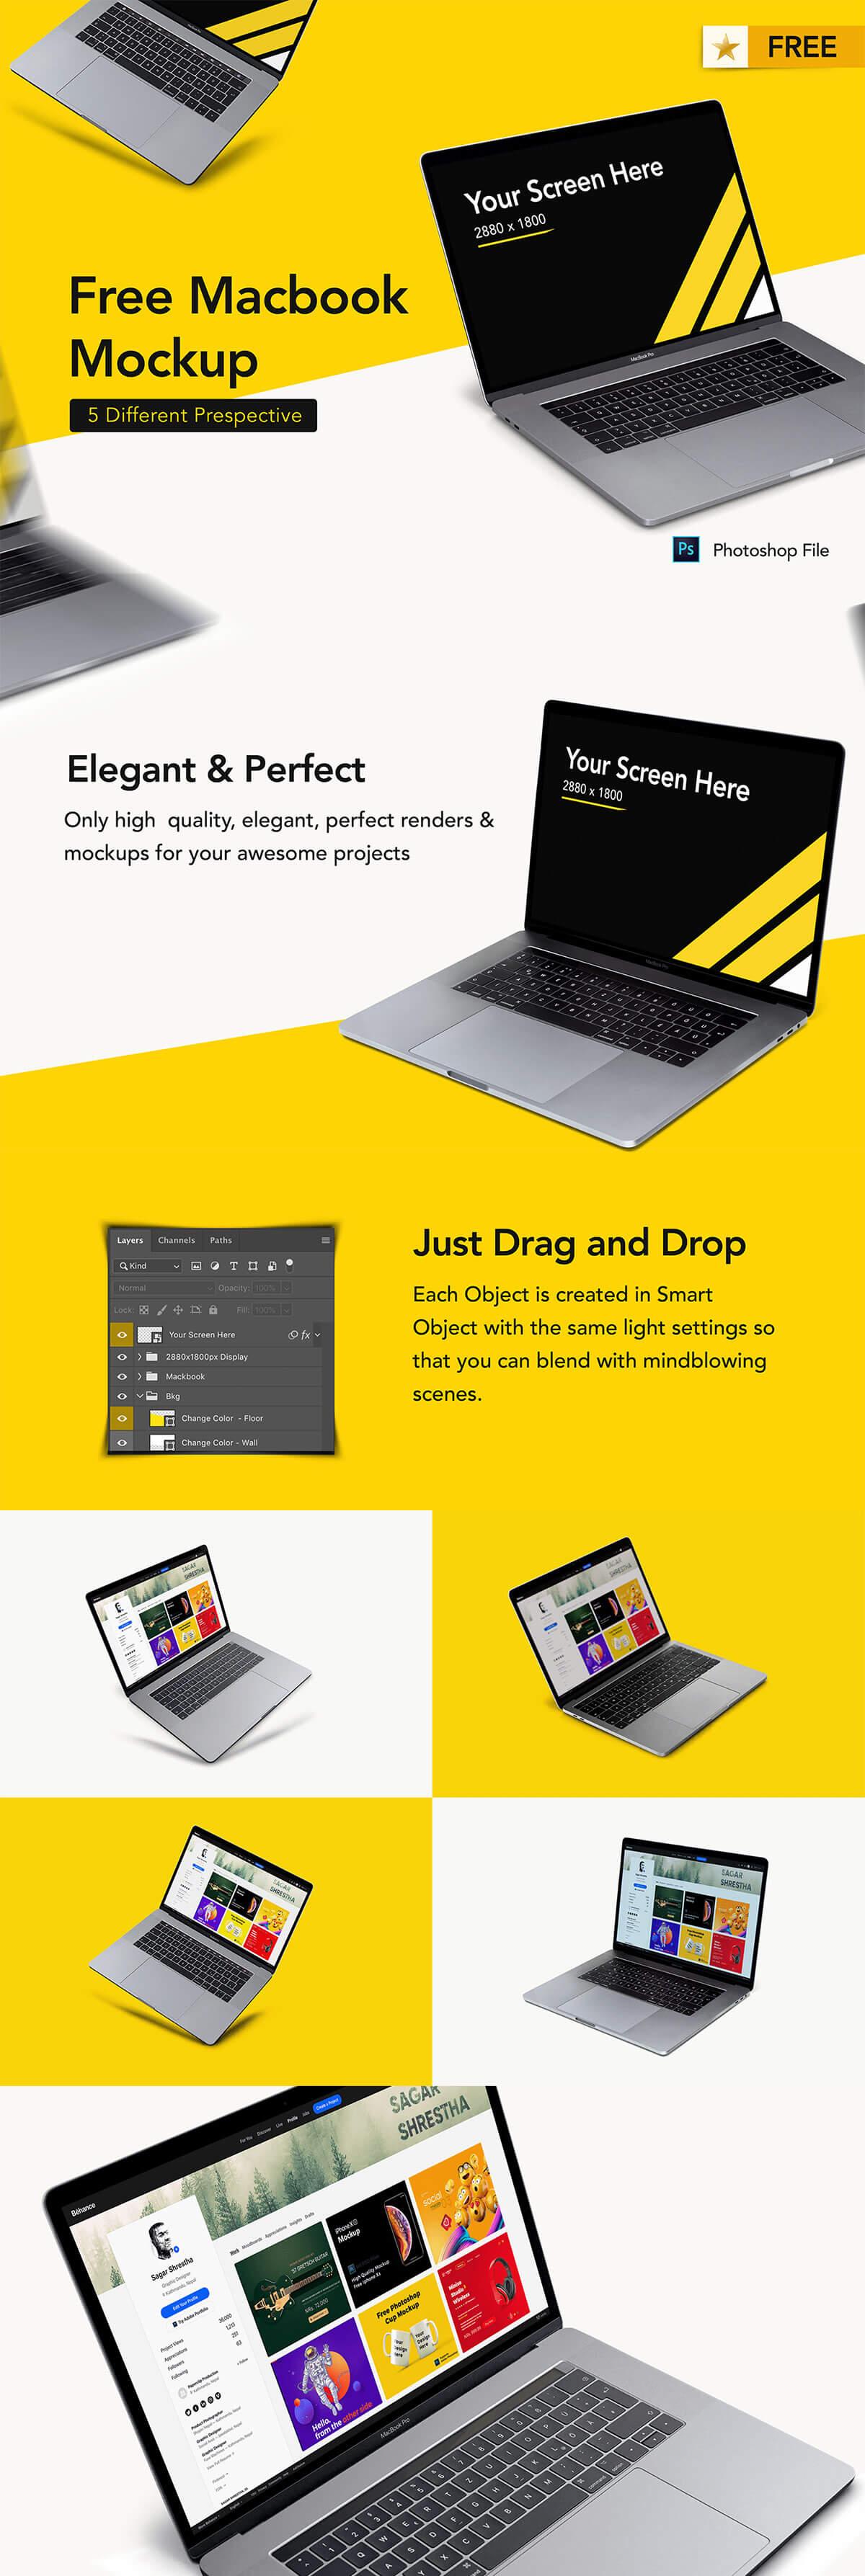 Free Macbook Set Mockup